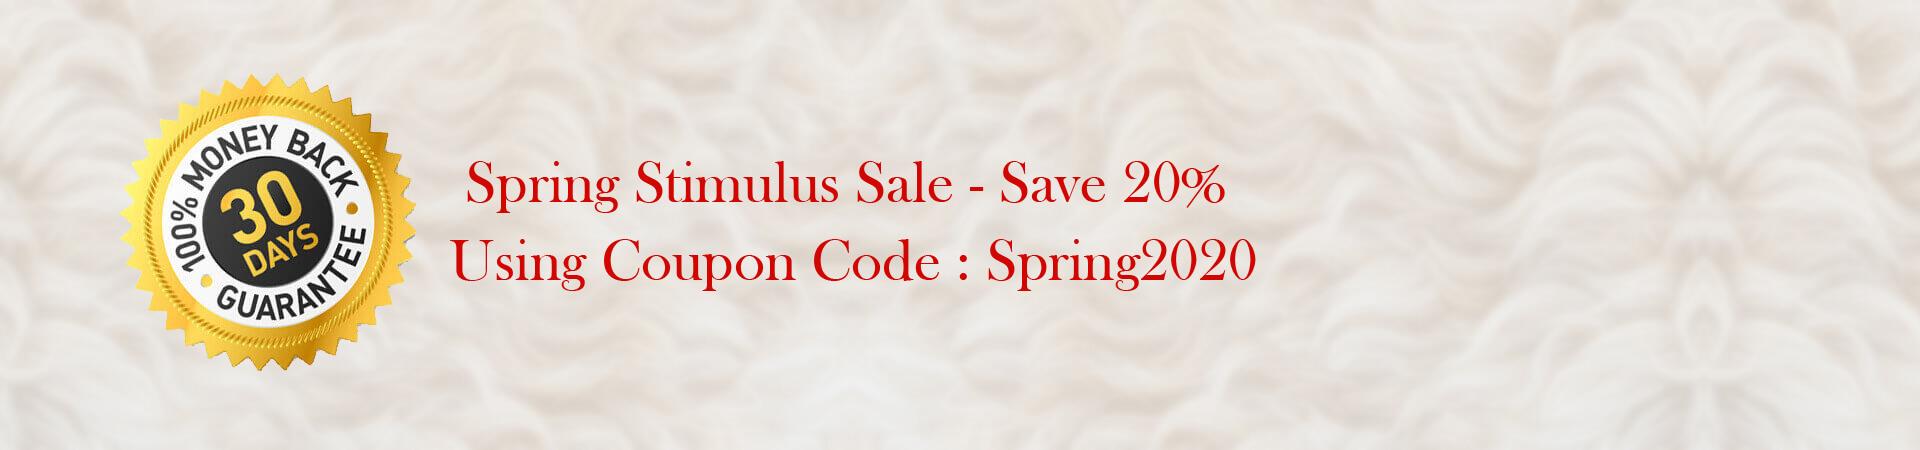 Spring Stimulus Sale - Save 20%